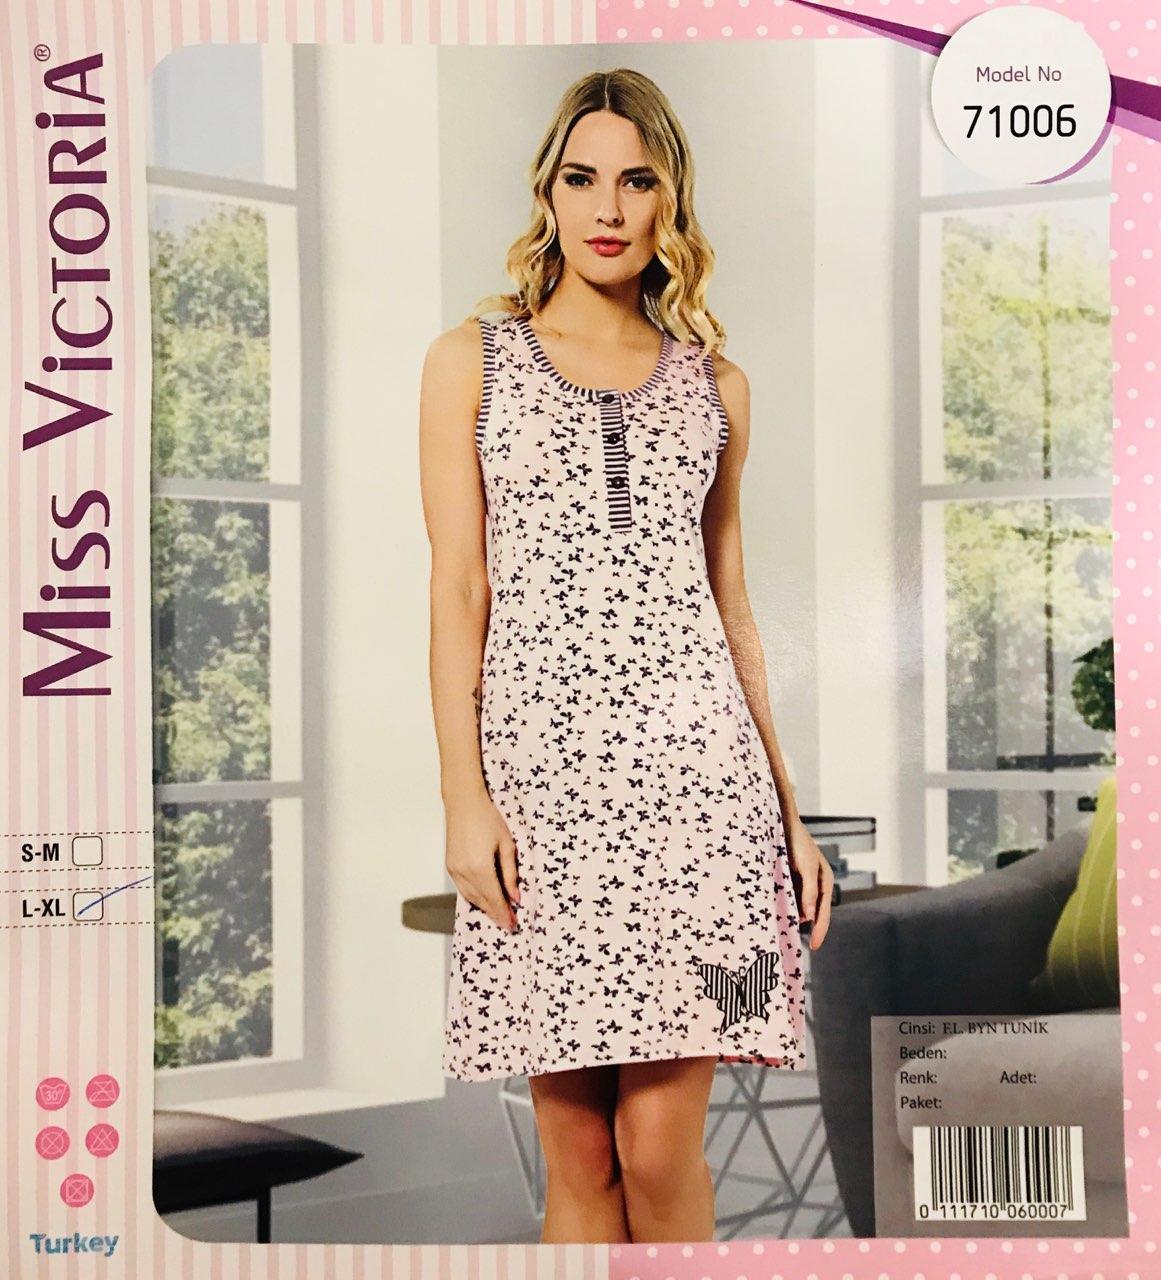 Женская пижама хлопок Miss Victoria Турция размер S-M(44-46) 71006